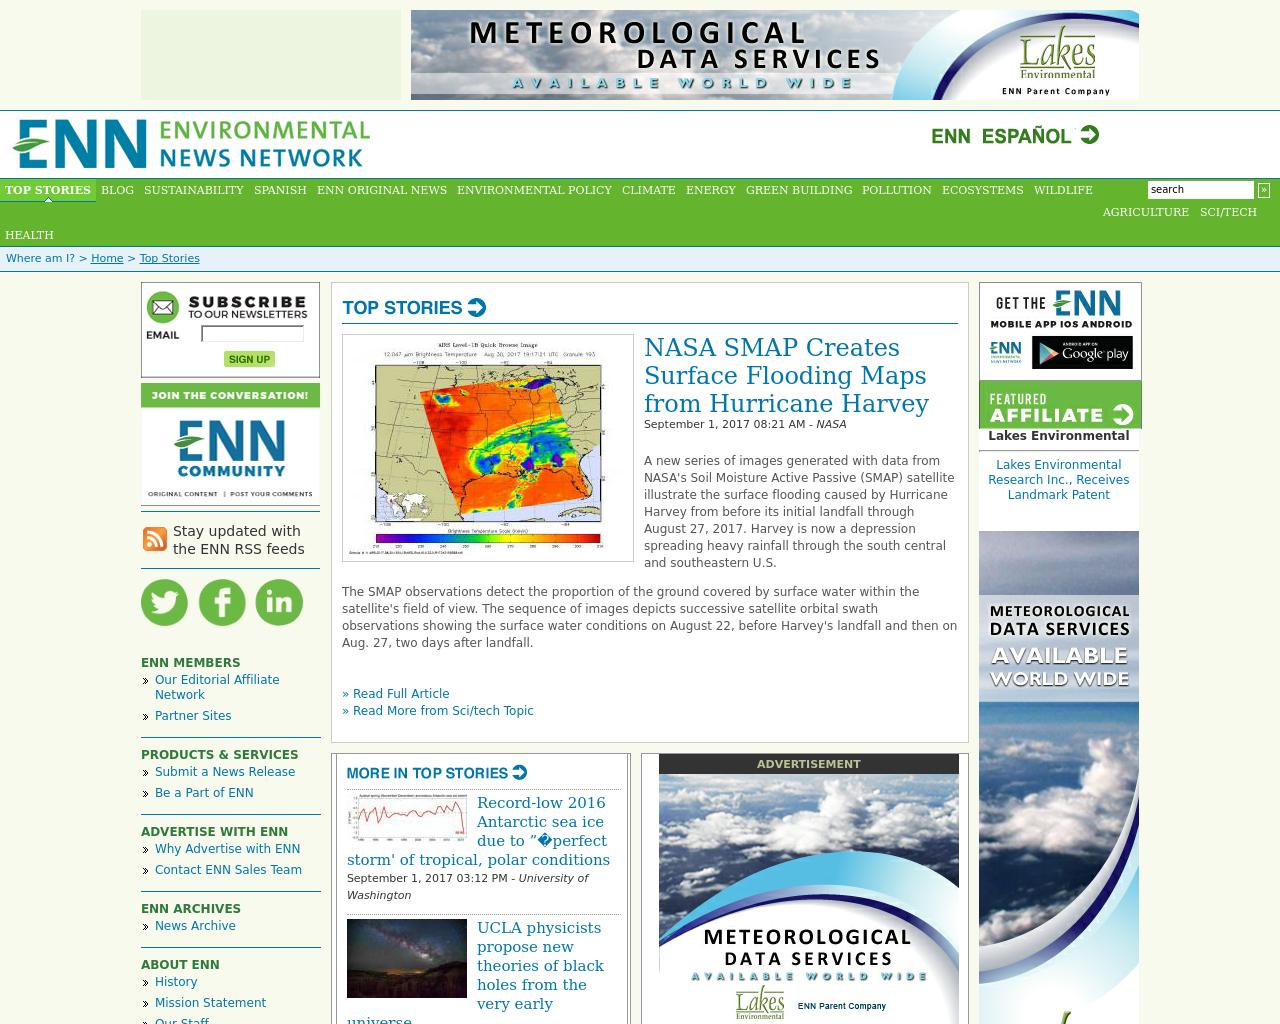 Environmental-News-Network-Advertising-Reviews-Pricing